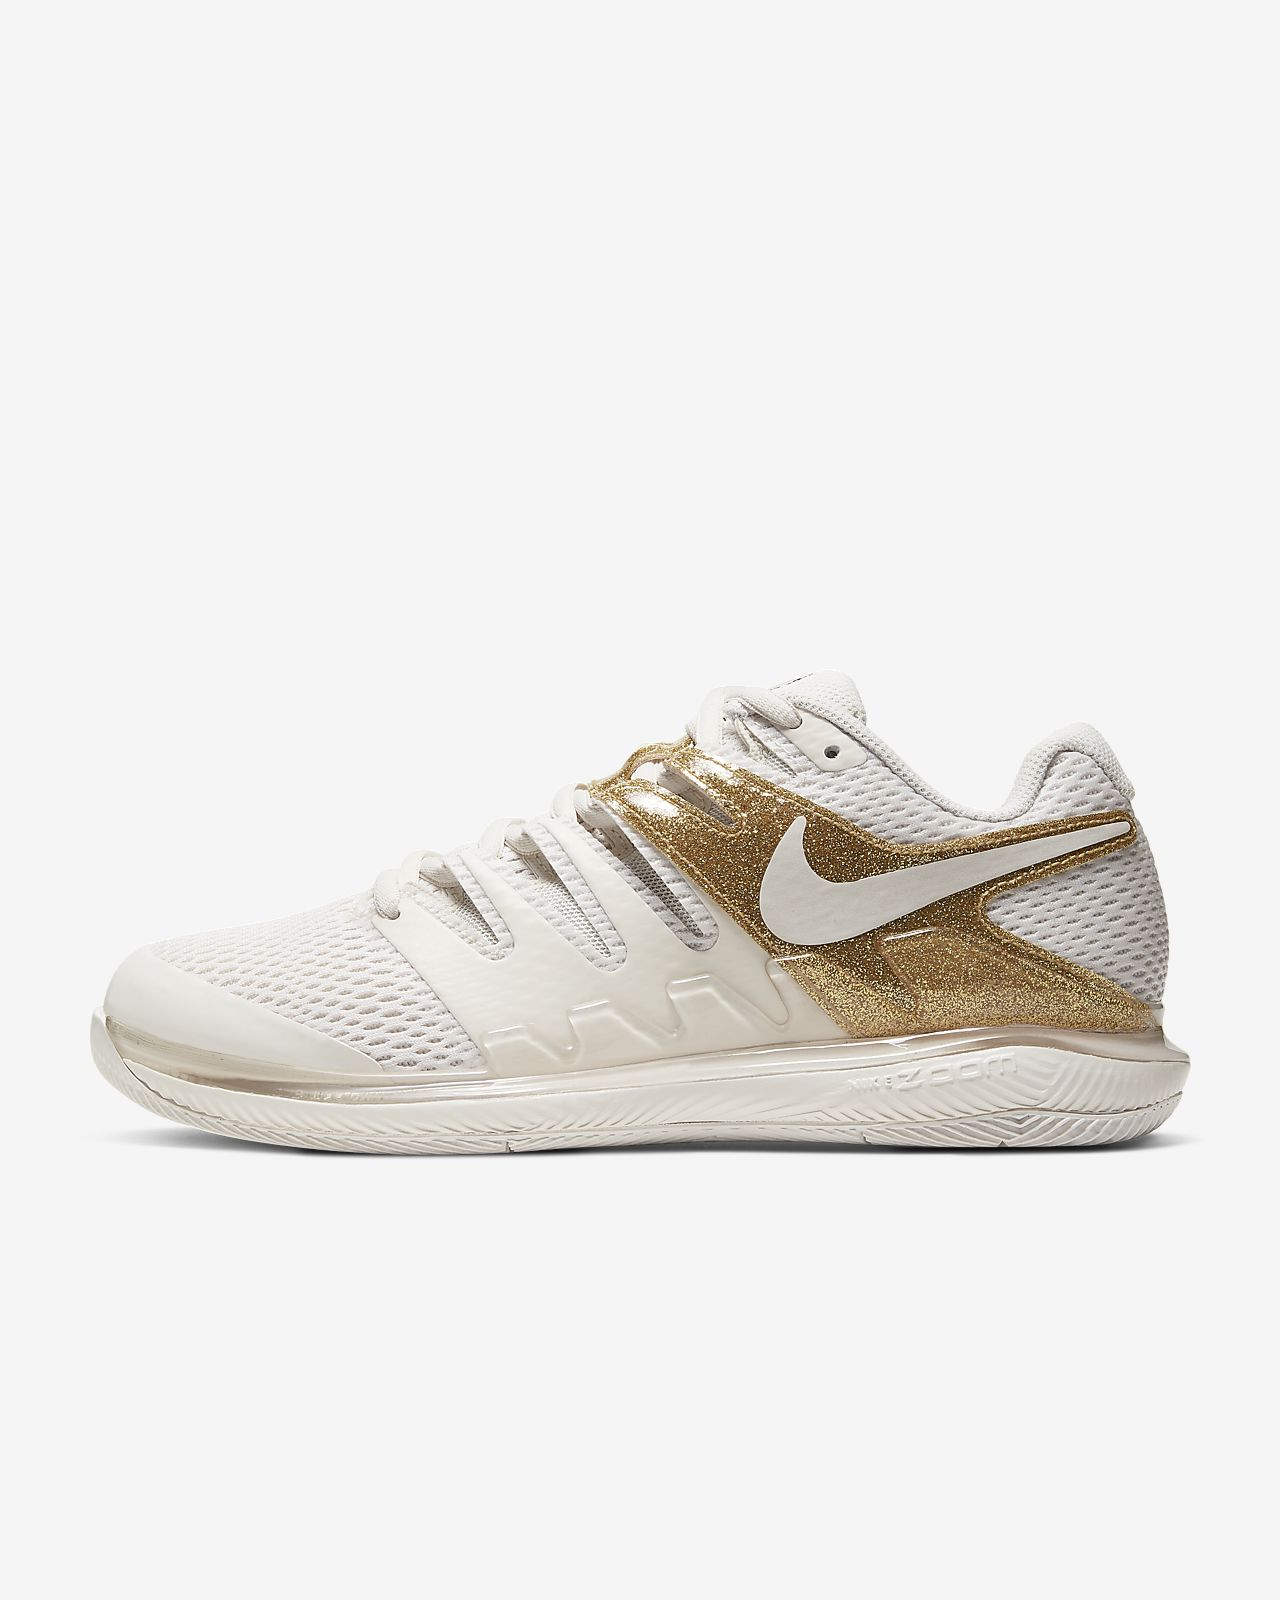 Nike Air Zoom Vapor X HC Hard Court 女子网球鞋